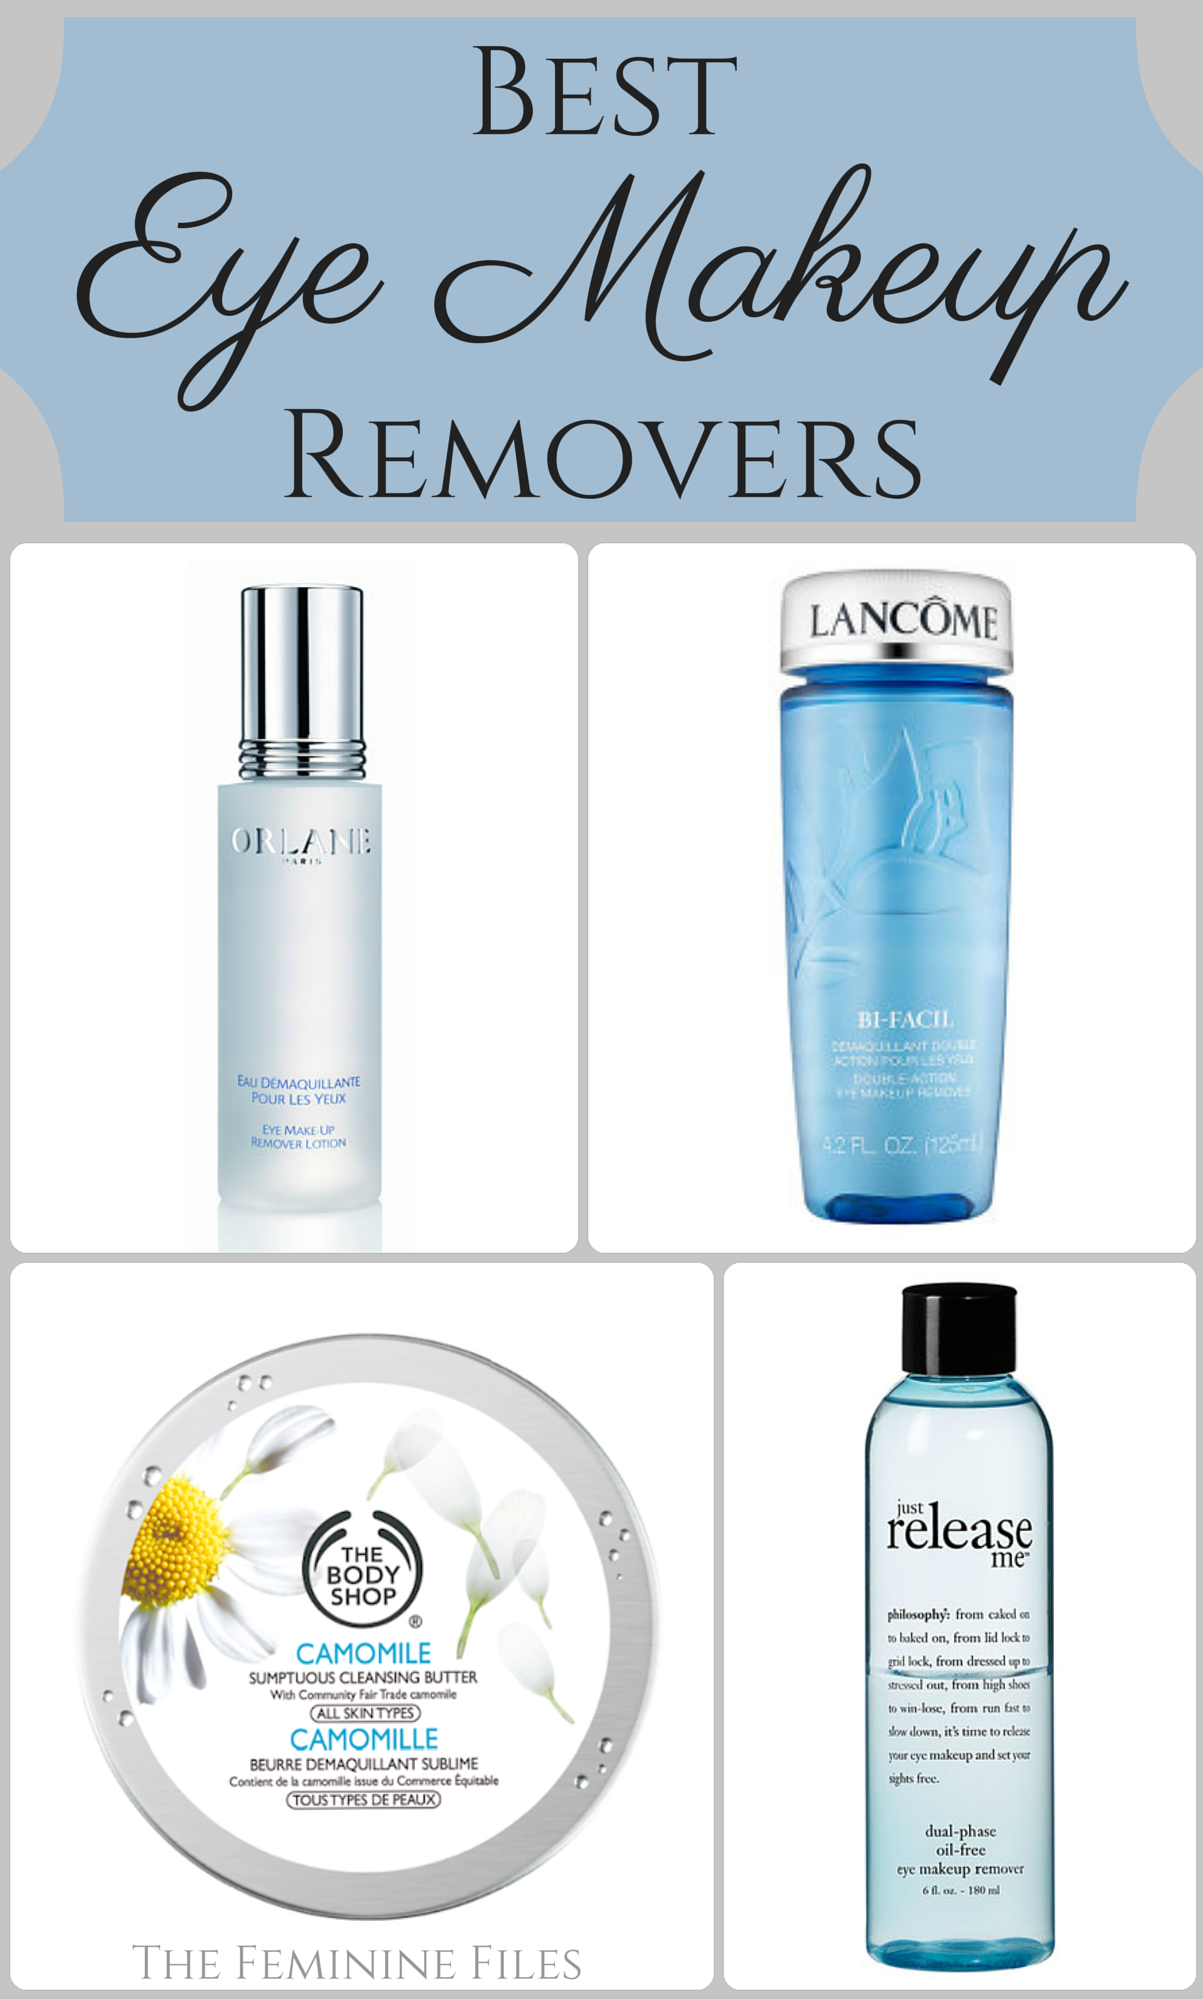 Best Eye Makeup Removers Best eye makeup remover, Eye